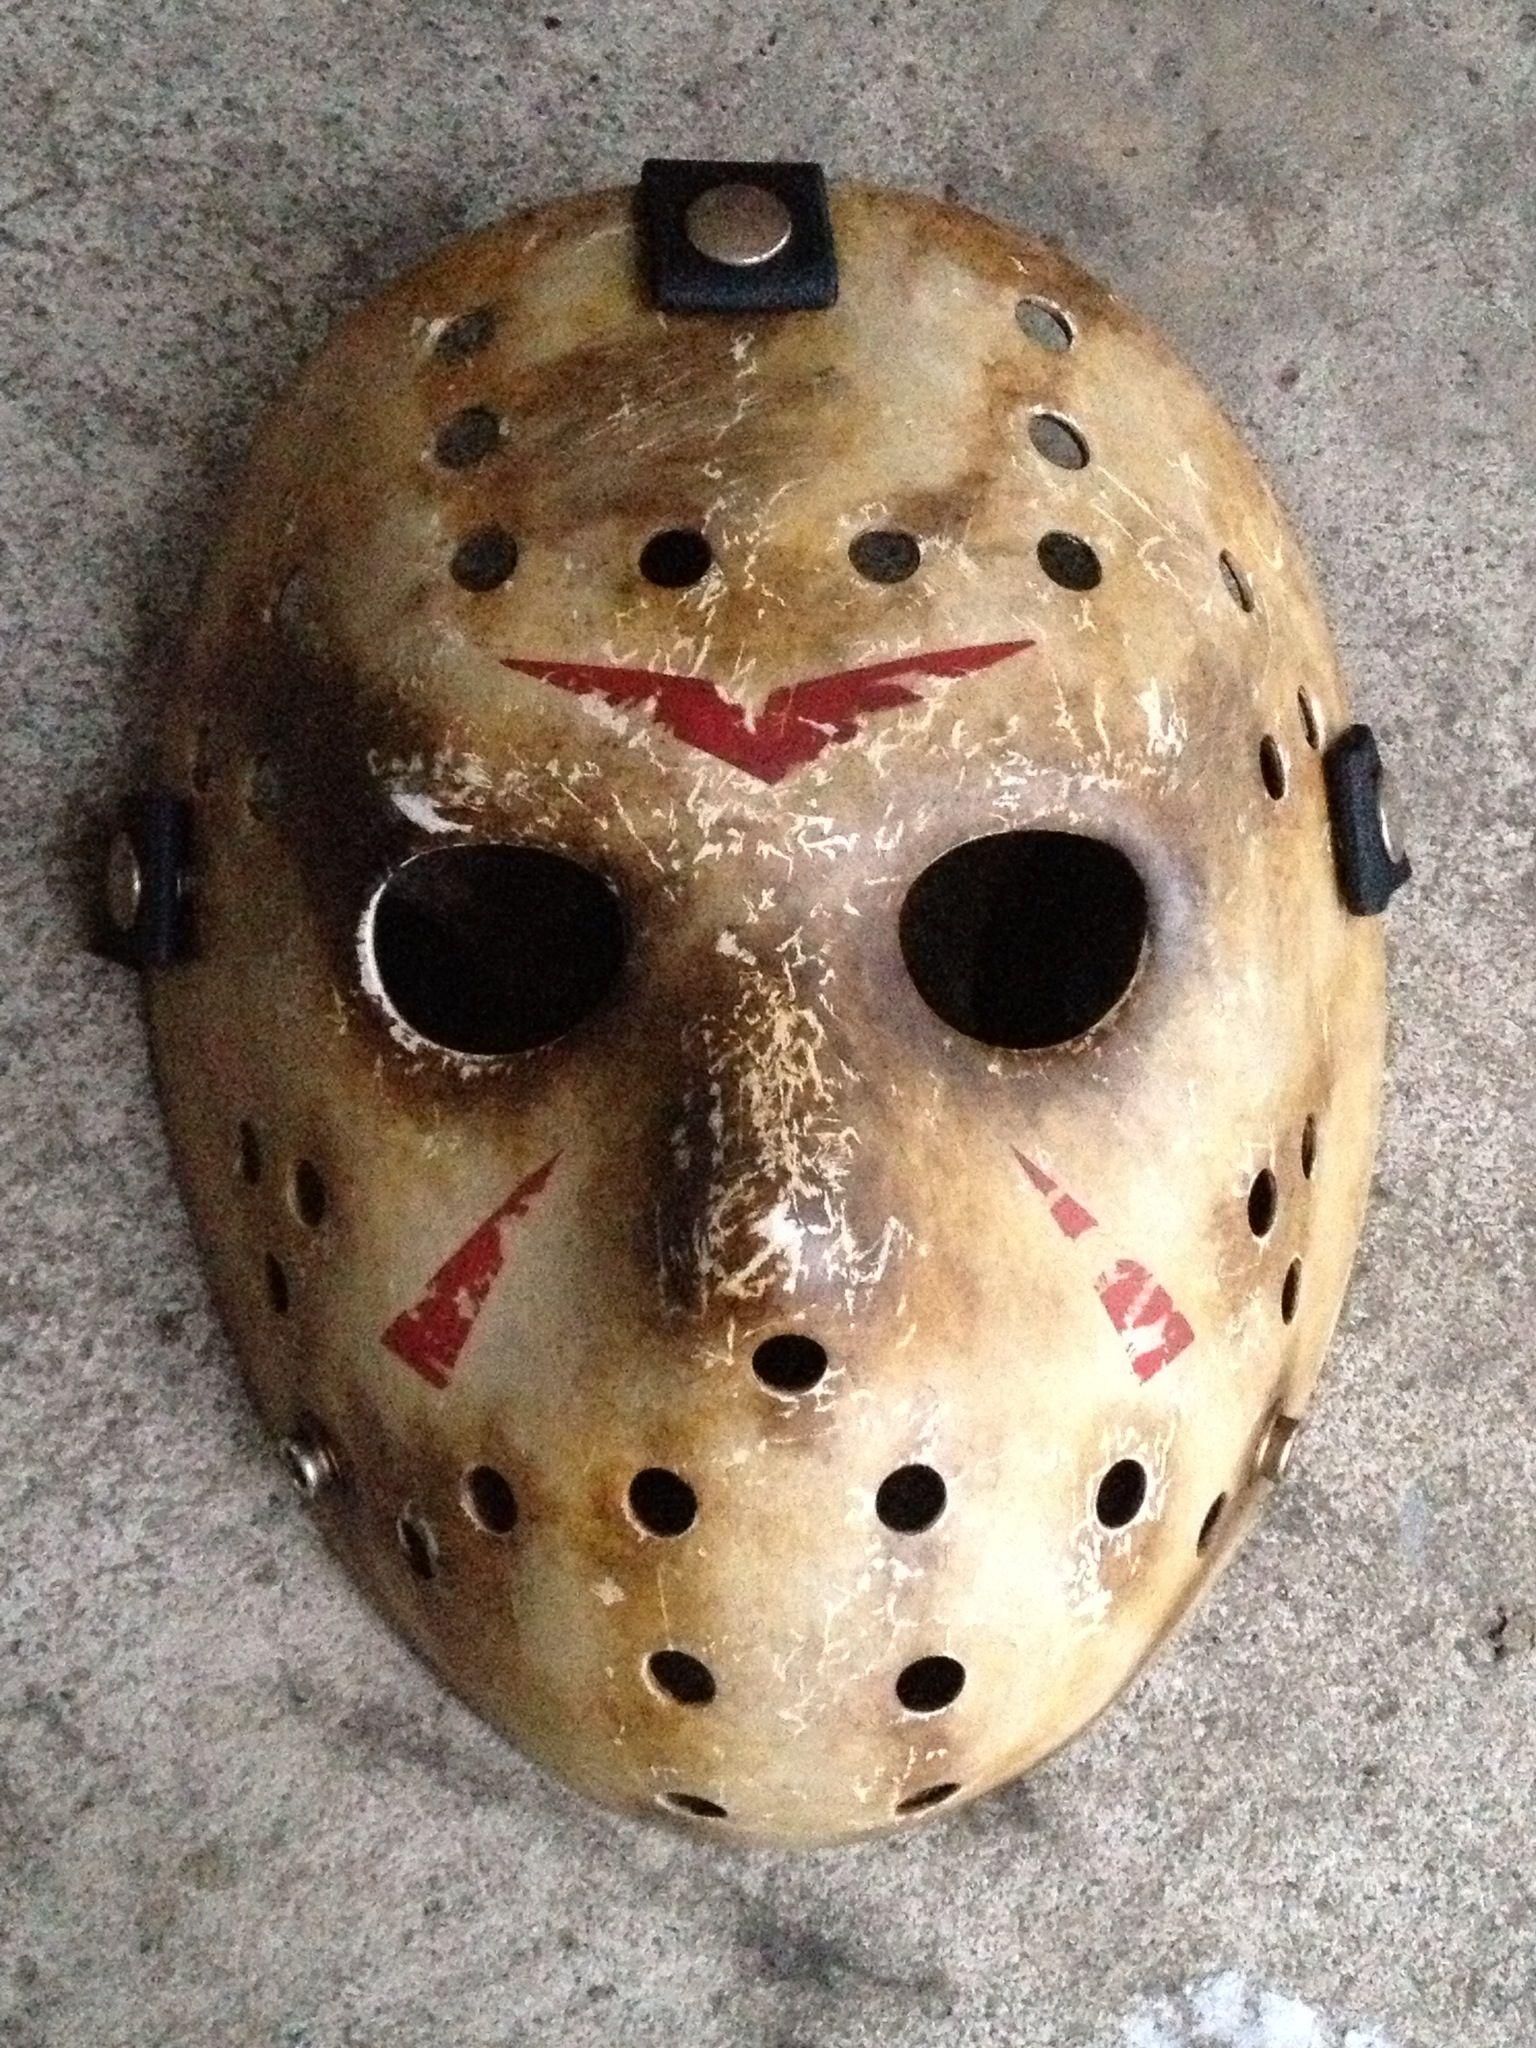 Ghoulish Creations Jason Voorhees remake mask. Jason